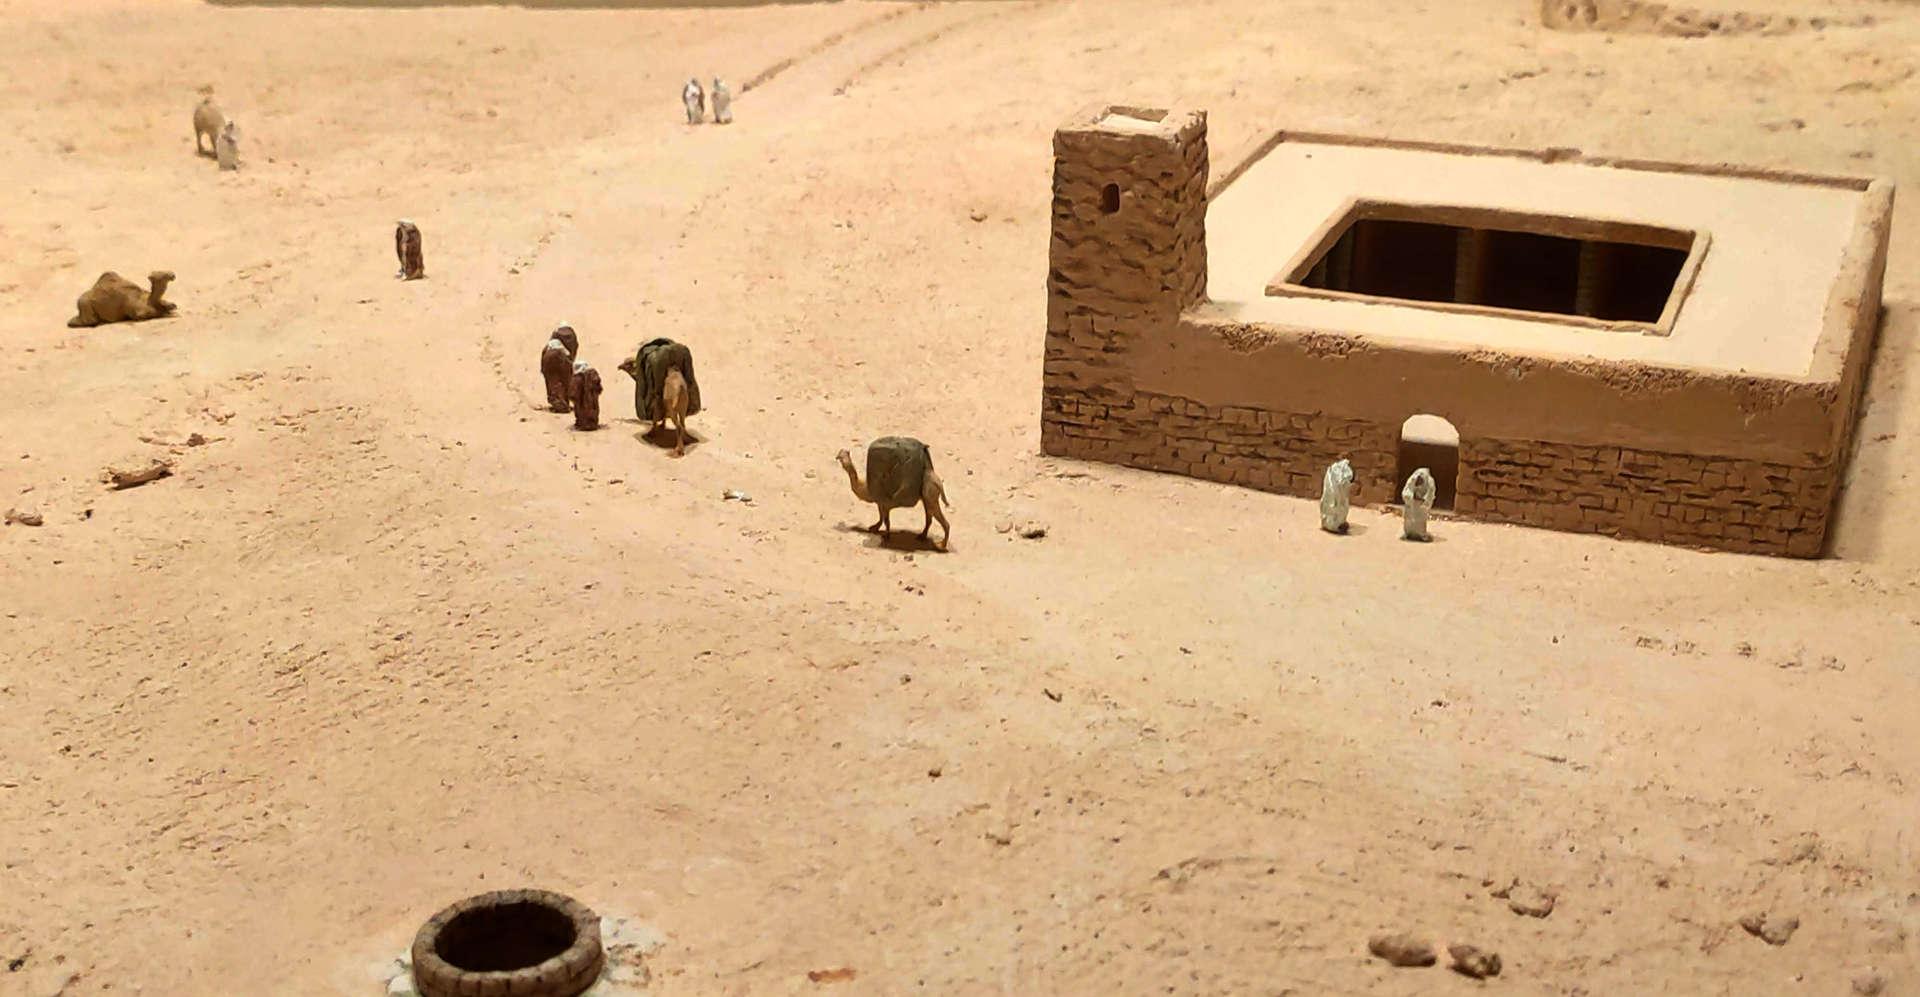 Saudia Arabia PAGANE uniques (23).jpg